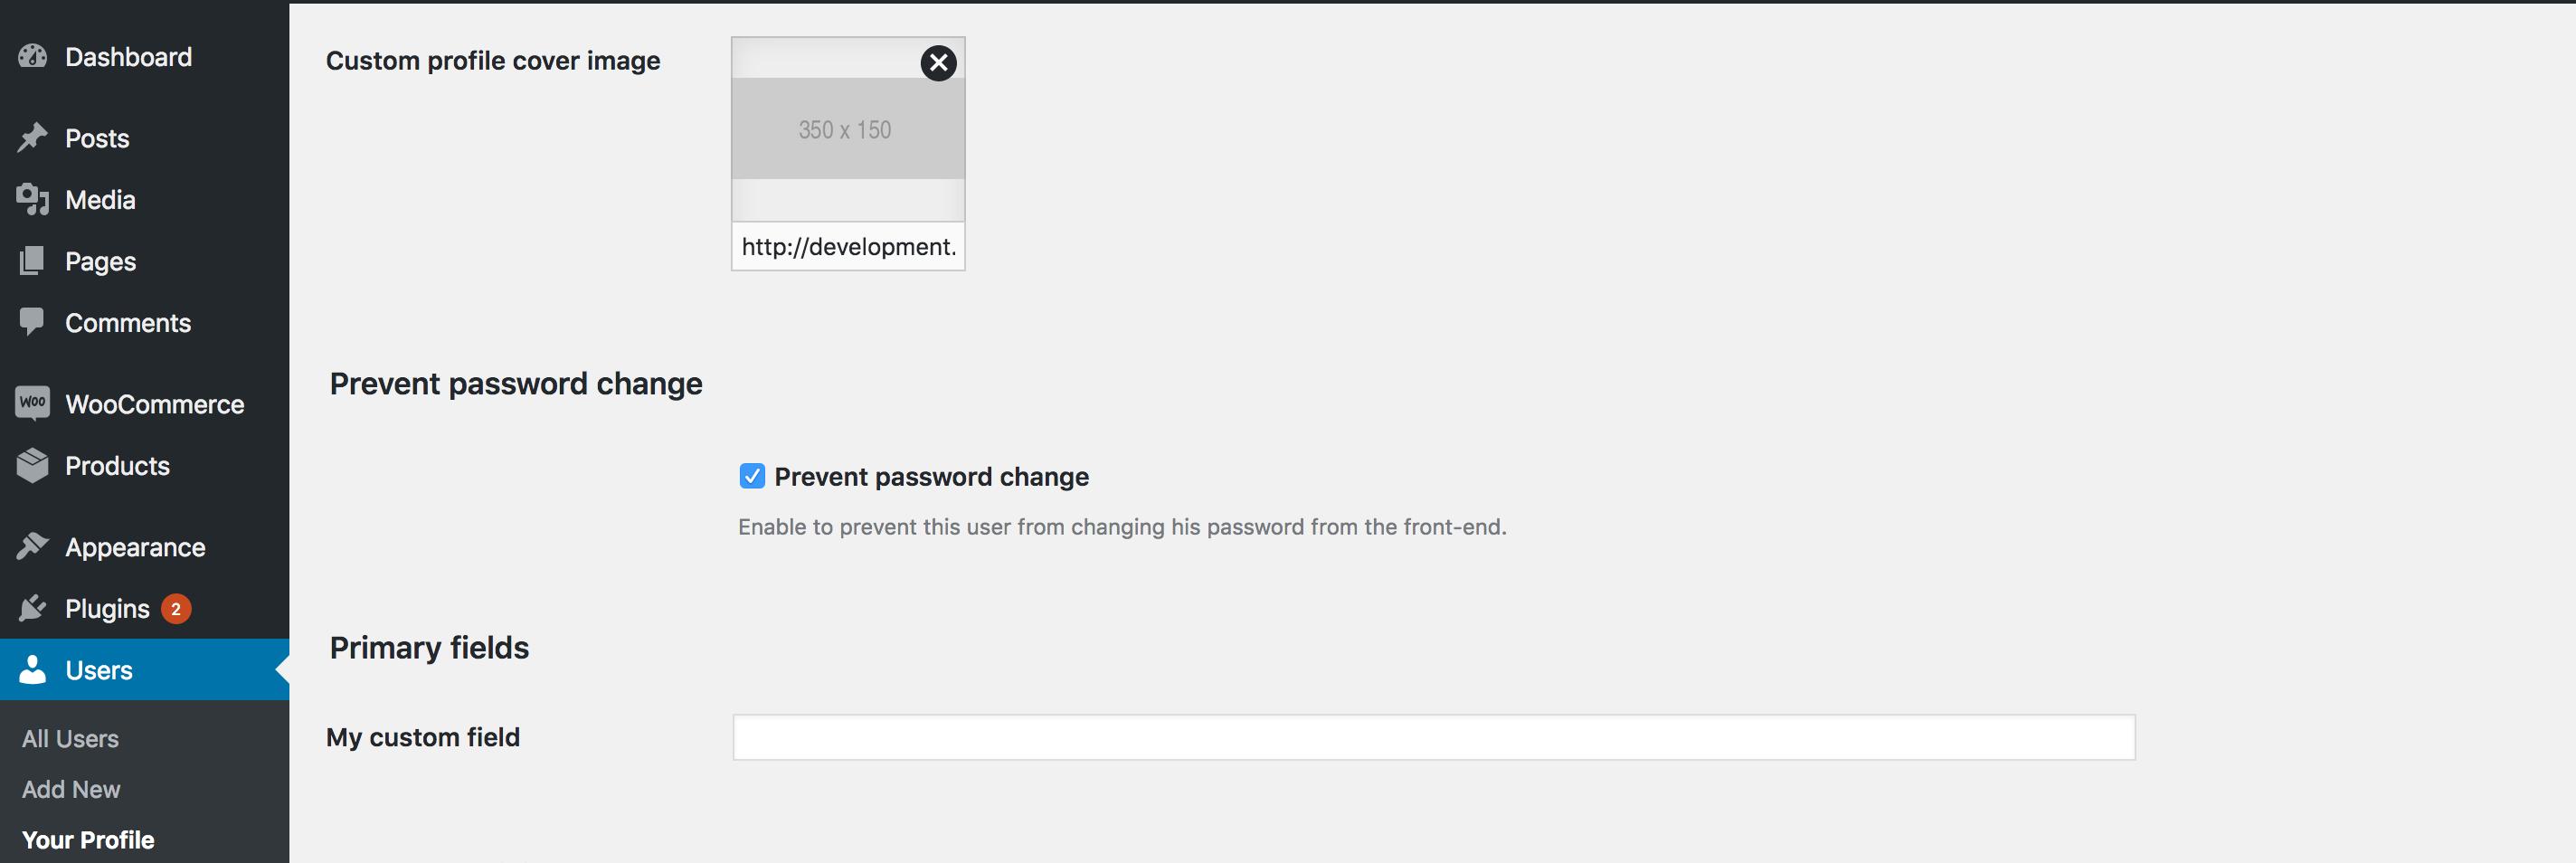 Administer Fields in the Dashboard screenshot